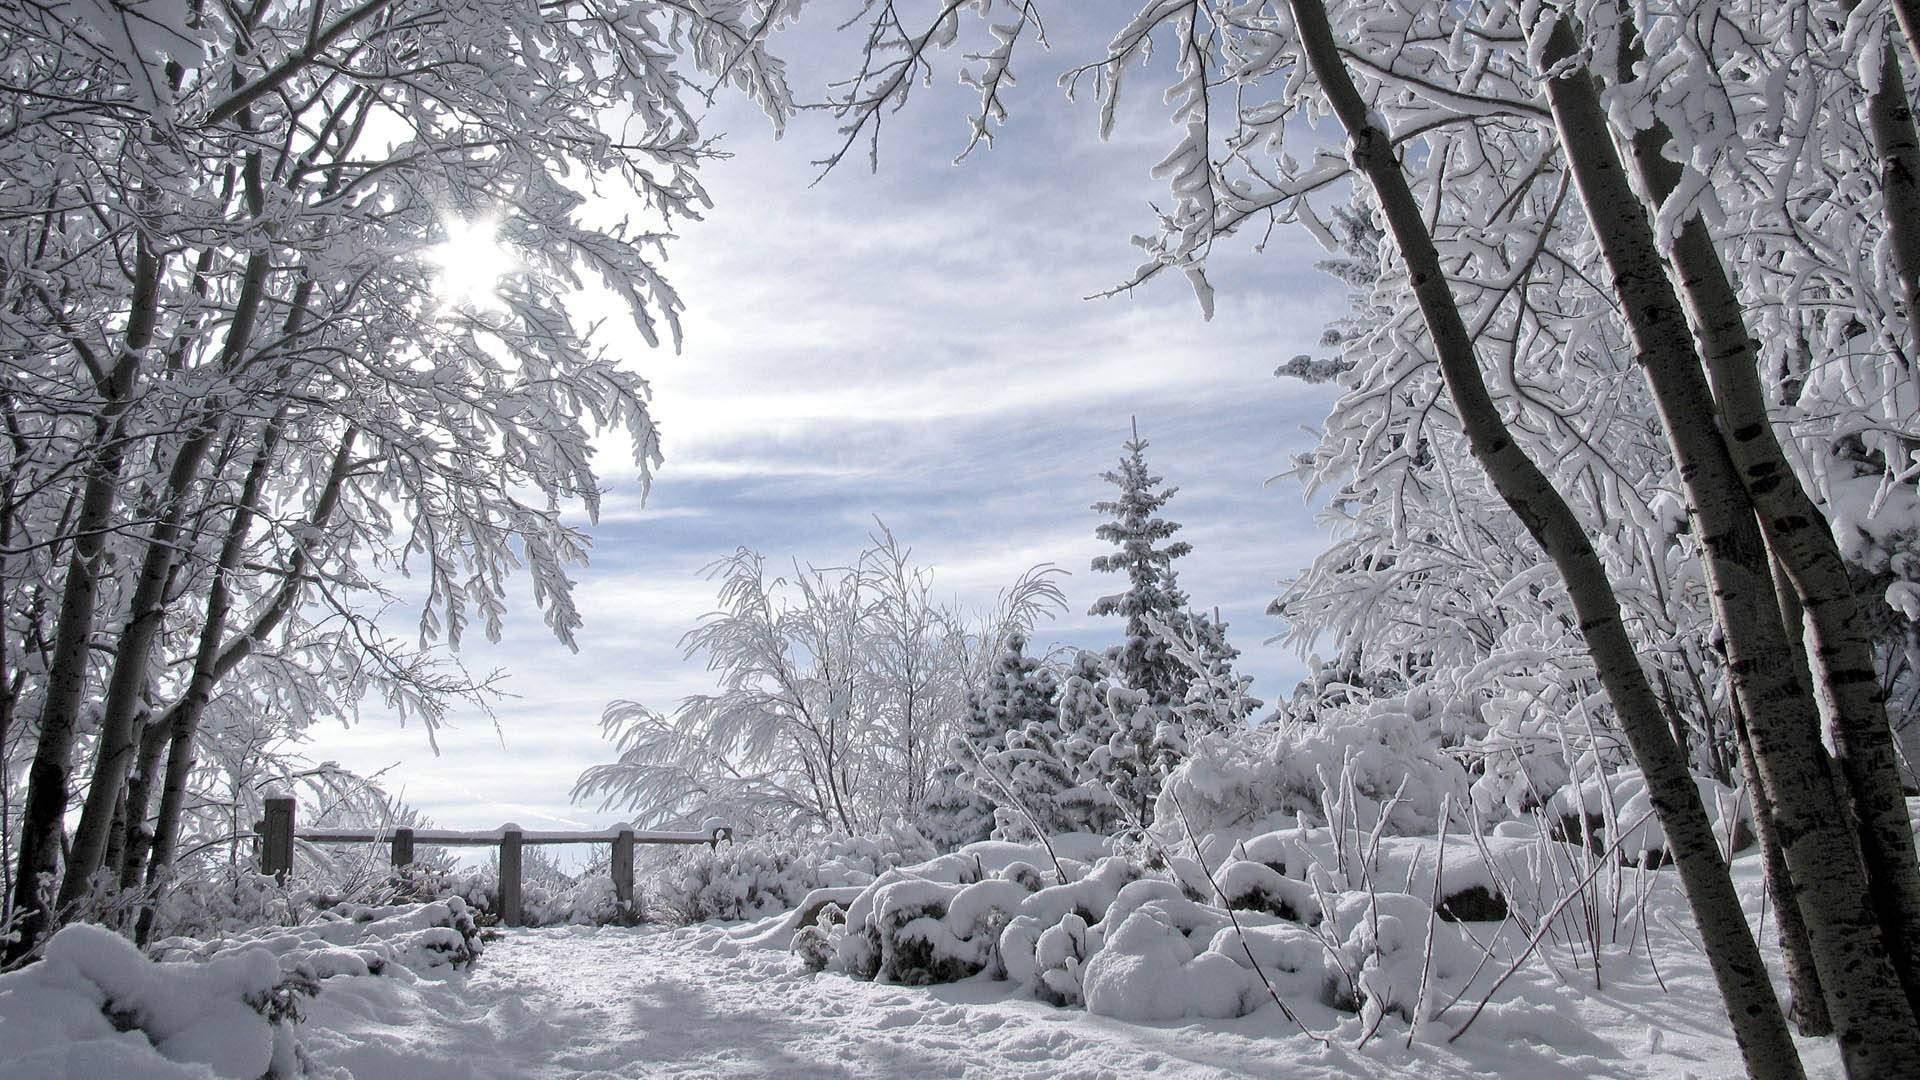 Duffy, Paul: The Light of Winter